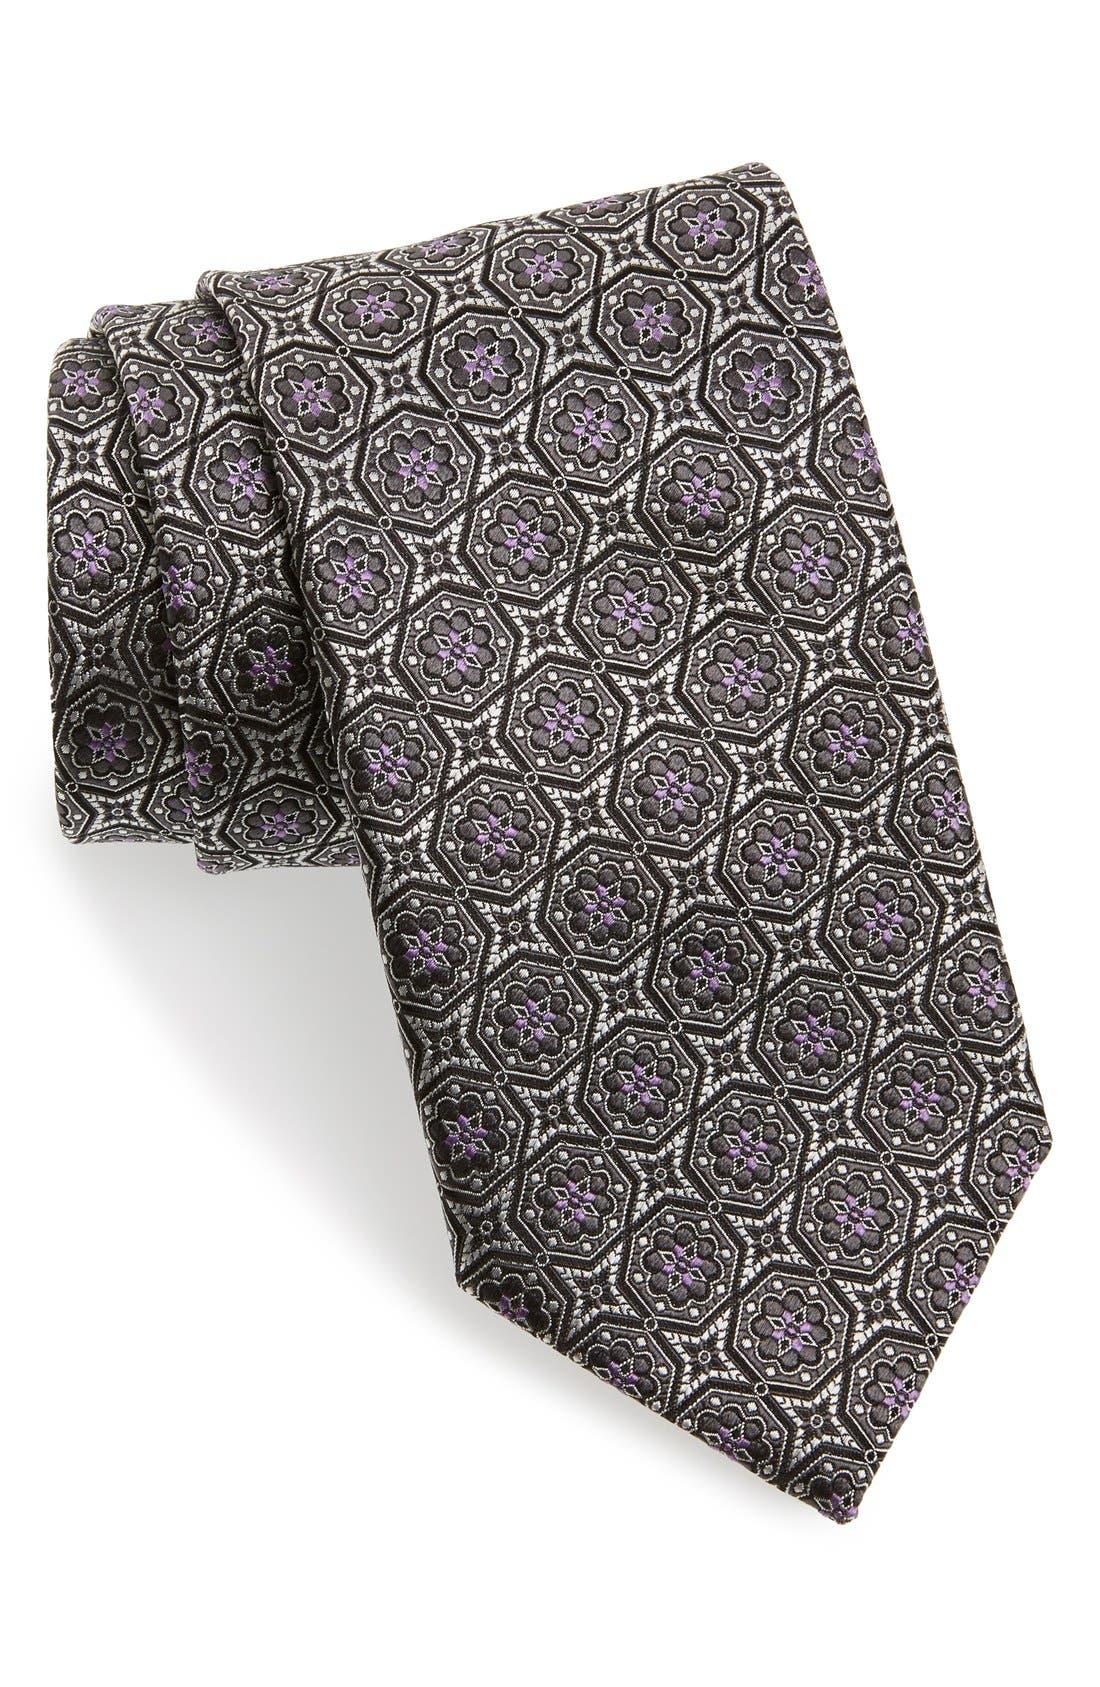 Main Image - Canali Medallion Silk Tie